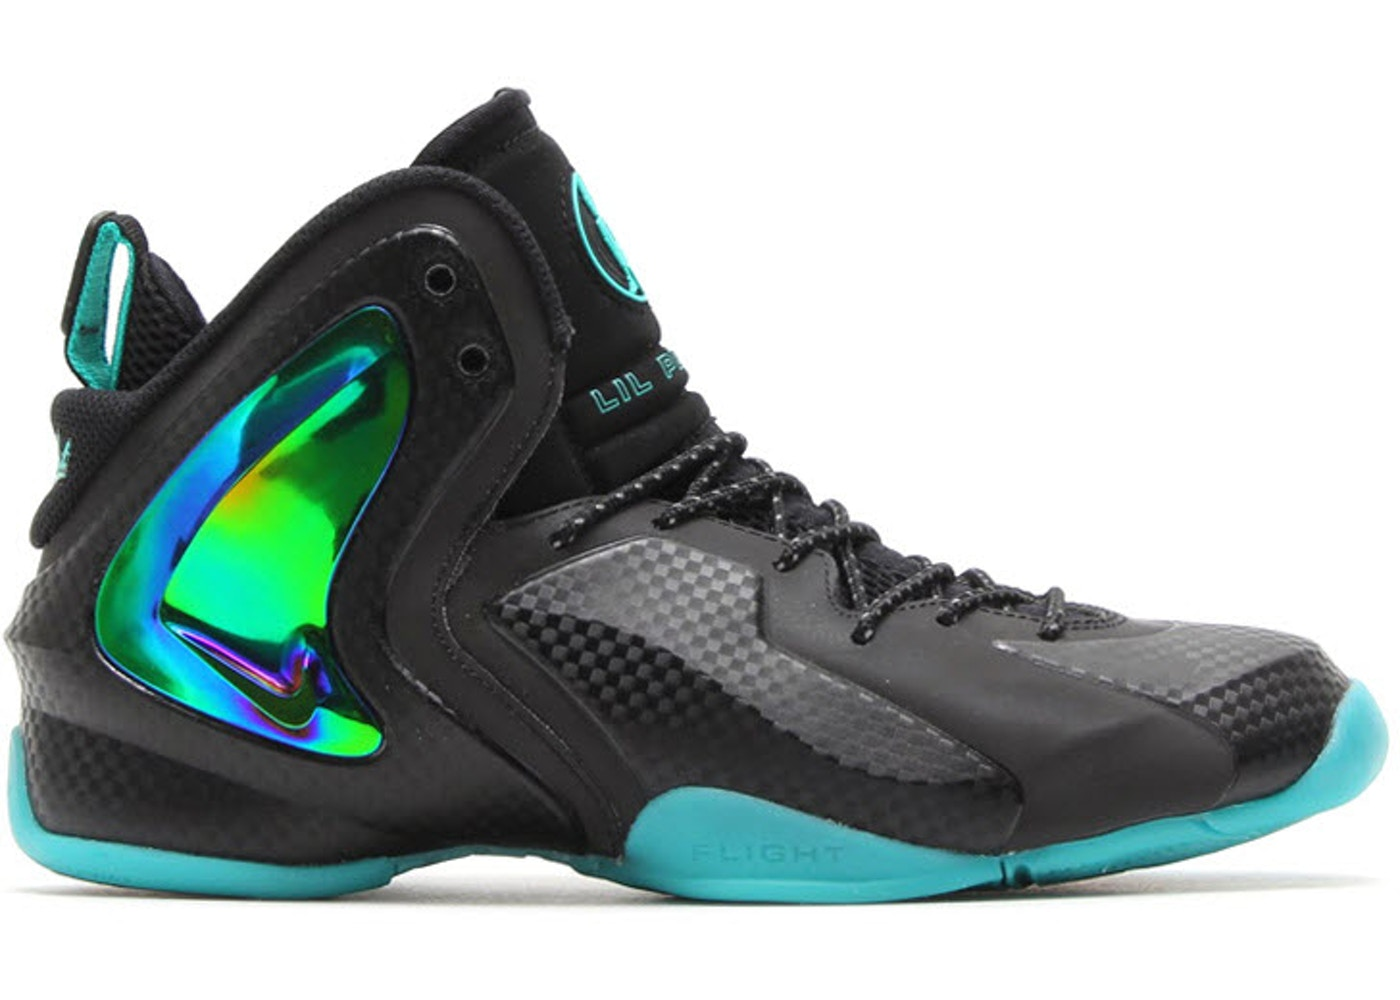 50e16b0b49f31 Nike Basketball Penny Shoes - Average Sale Price